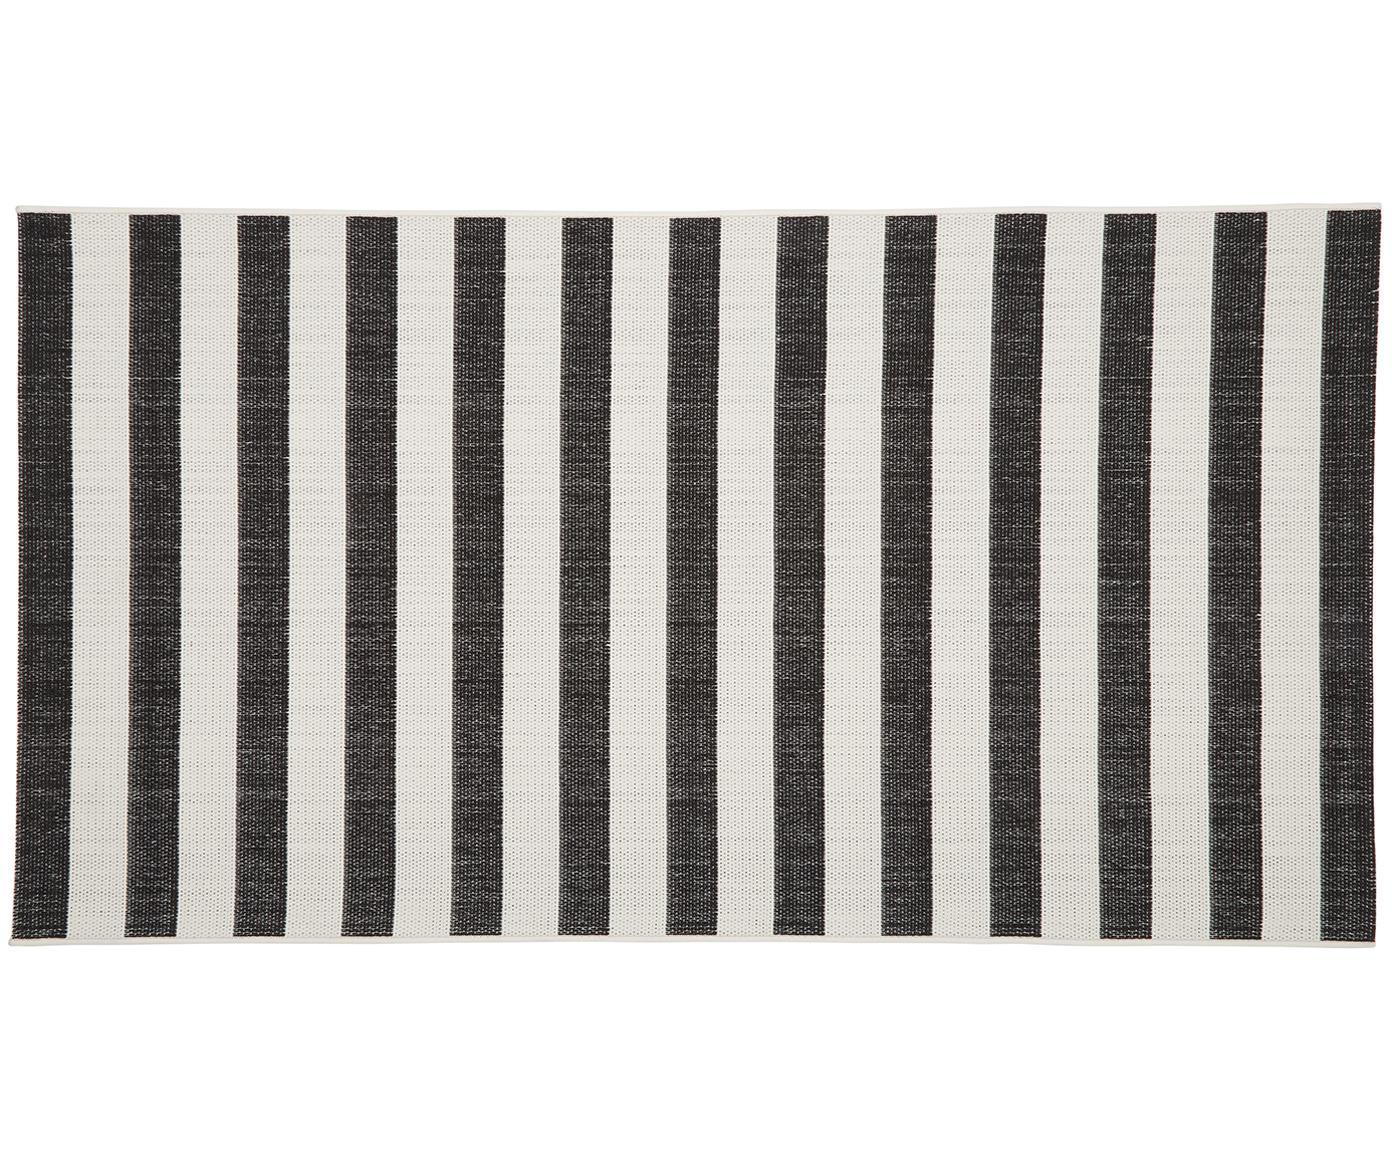 Gestreifter In- & Outdoor-Teppich Axa in Schwarz/Weiss, Flor: 100% Polypropylen, Cremeweiss, Schwarz, B 80 x L 150 cm (Grösse XS)